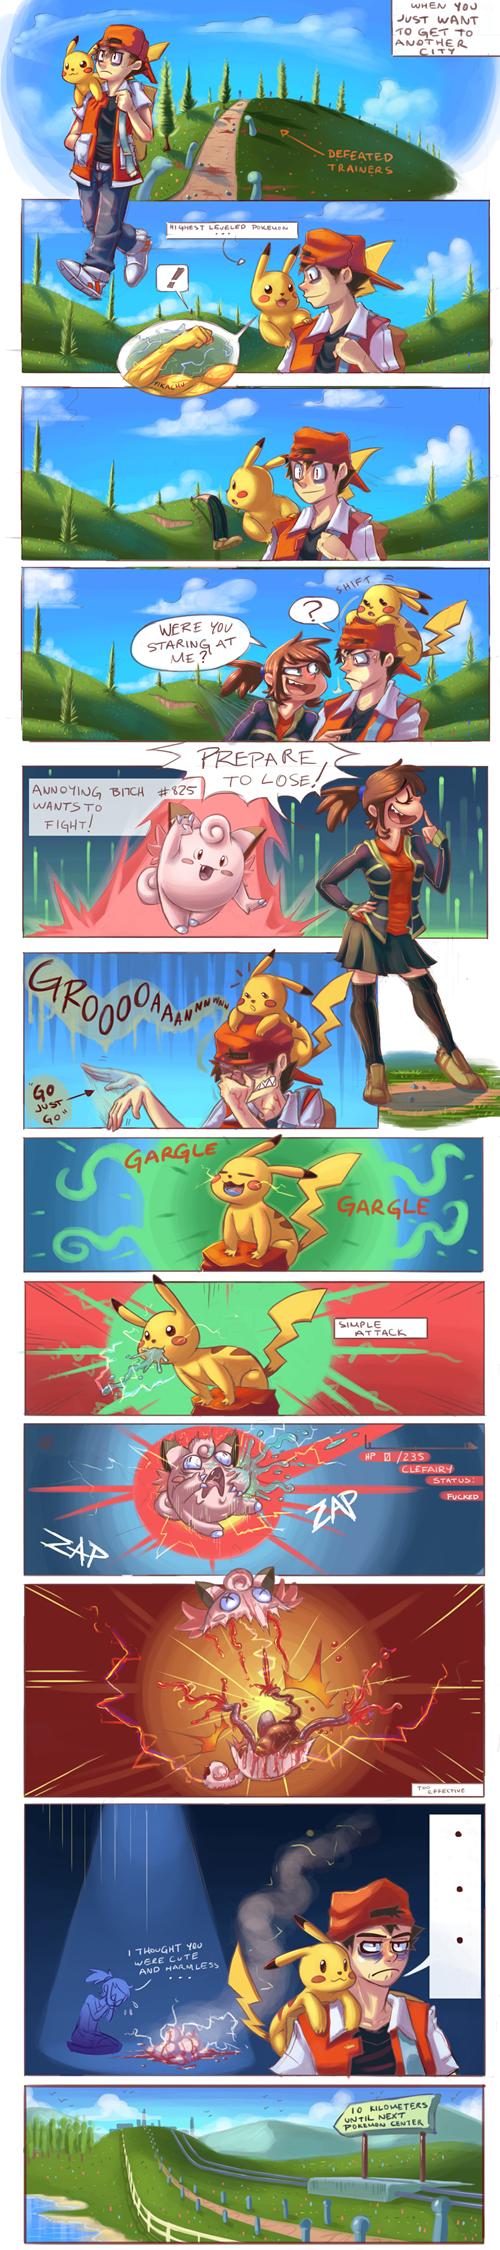 Pokémon comics battling - 7788124672